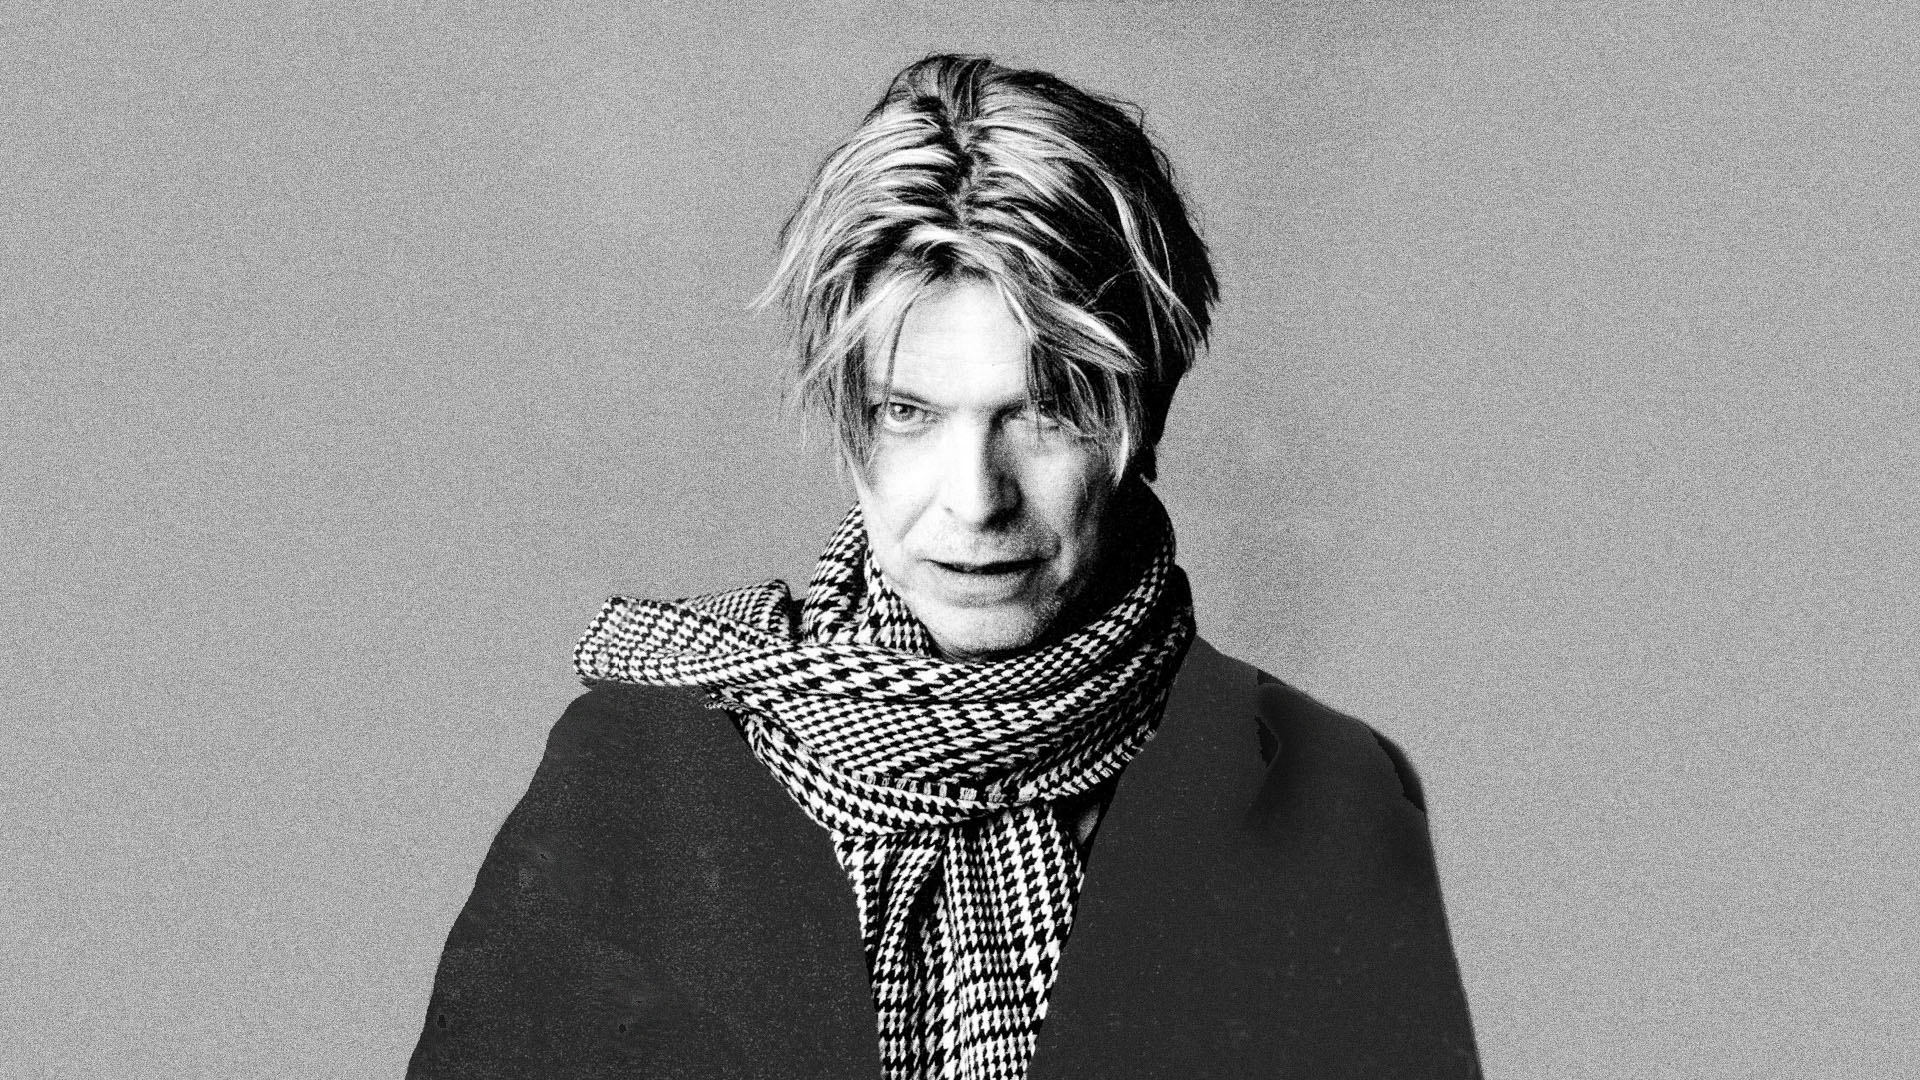 Music David Bowie 1920x1080